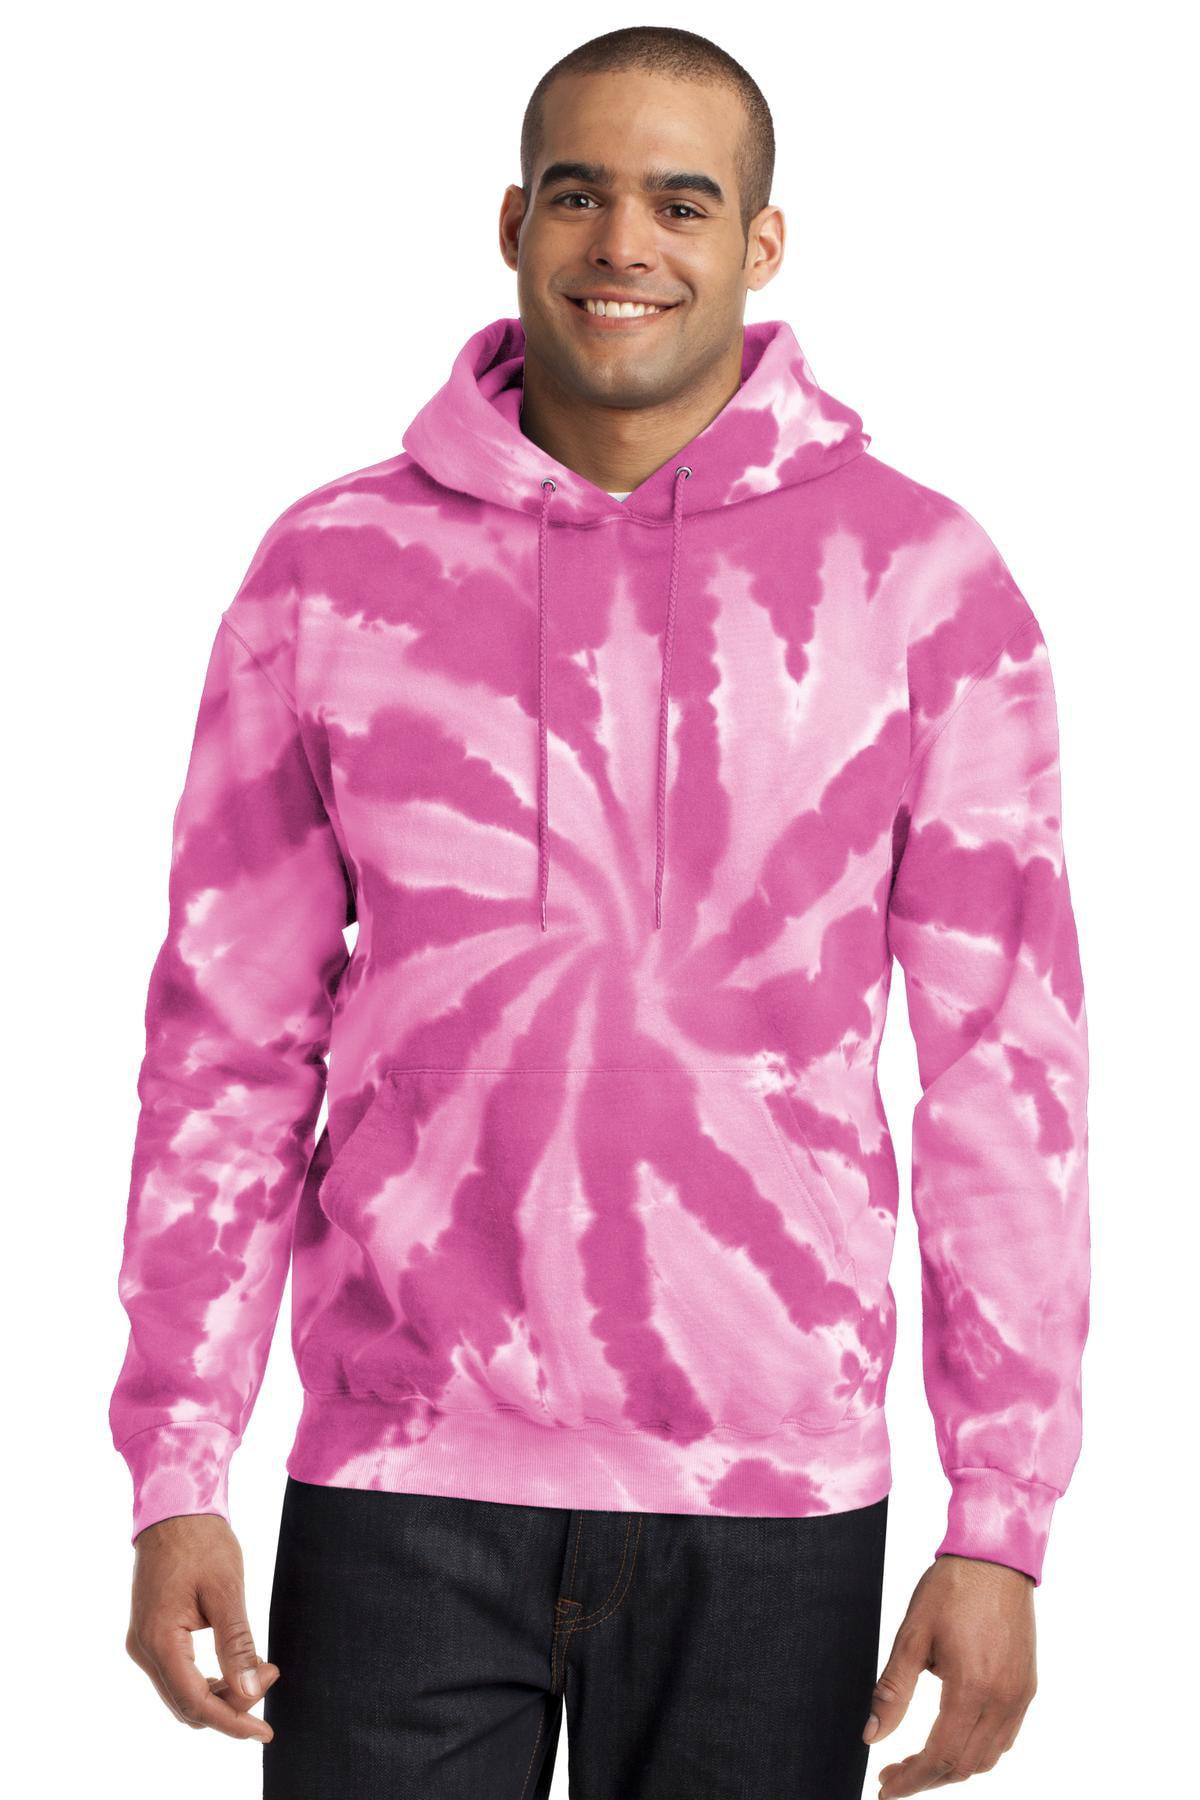 PC90H Purple/_XL Port /& Company Pullover Hooded Sweatshirt